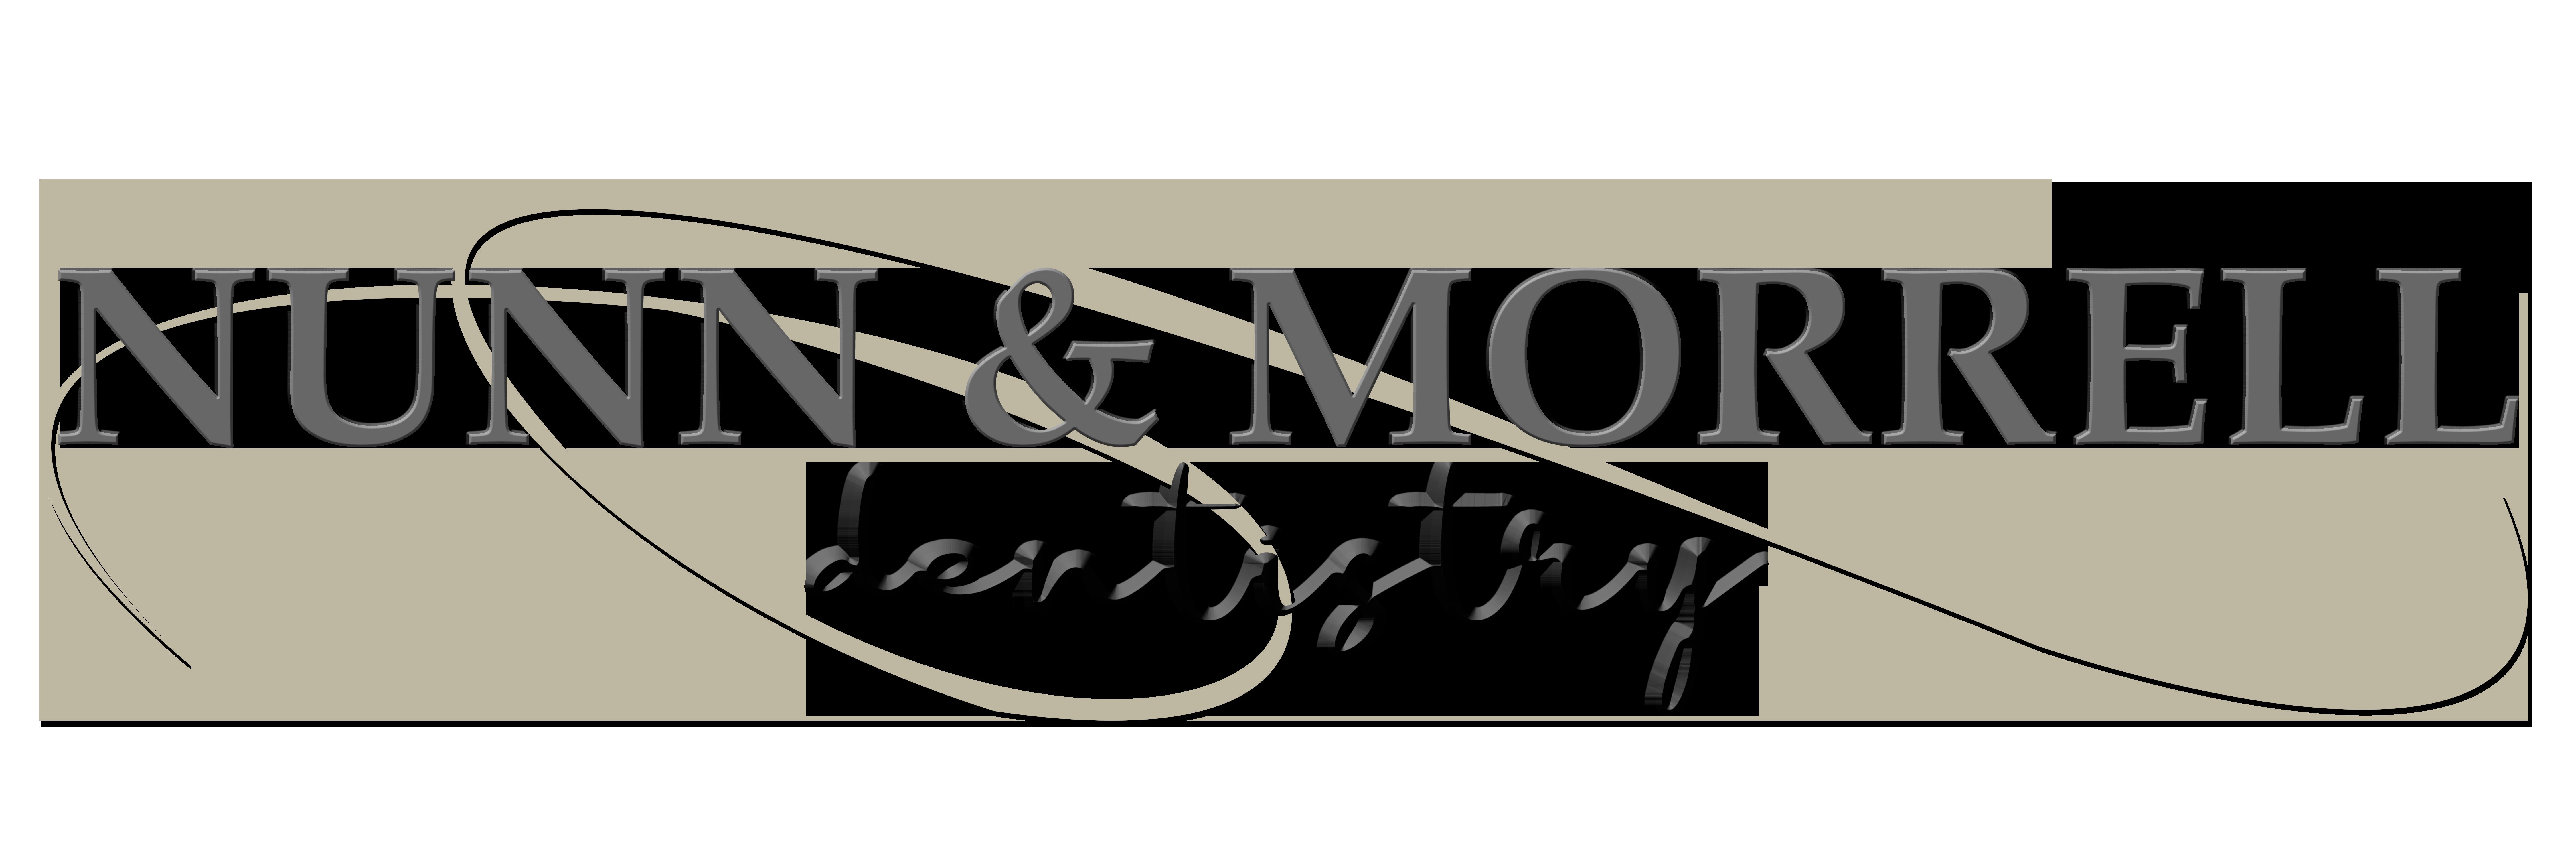 Conroe dental practice, dental care, family dentistry | Nunn & Morrell